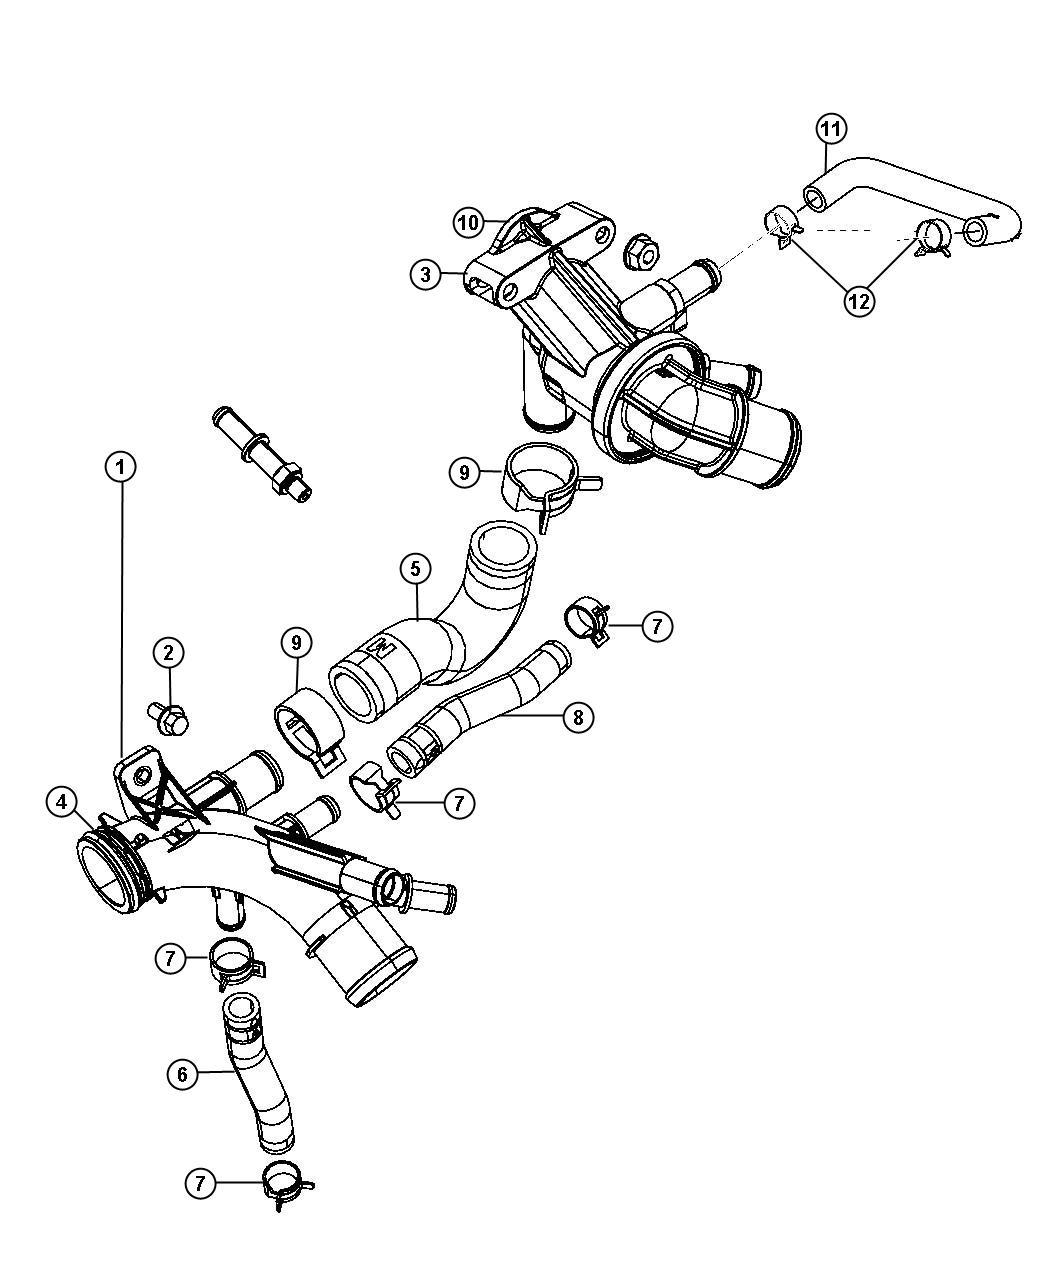 2007 Dodge Nitro O ring. Mounting. Drain plug, fits over